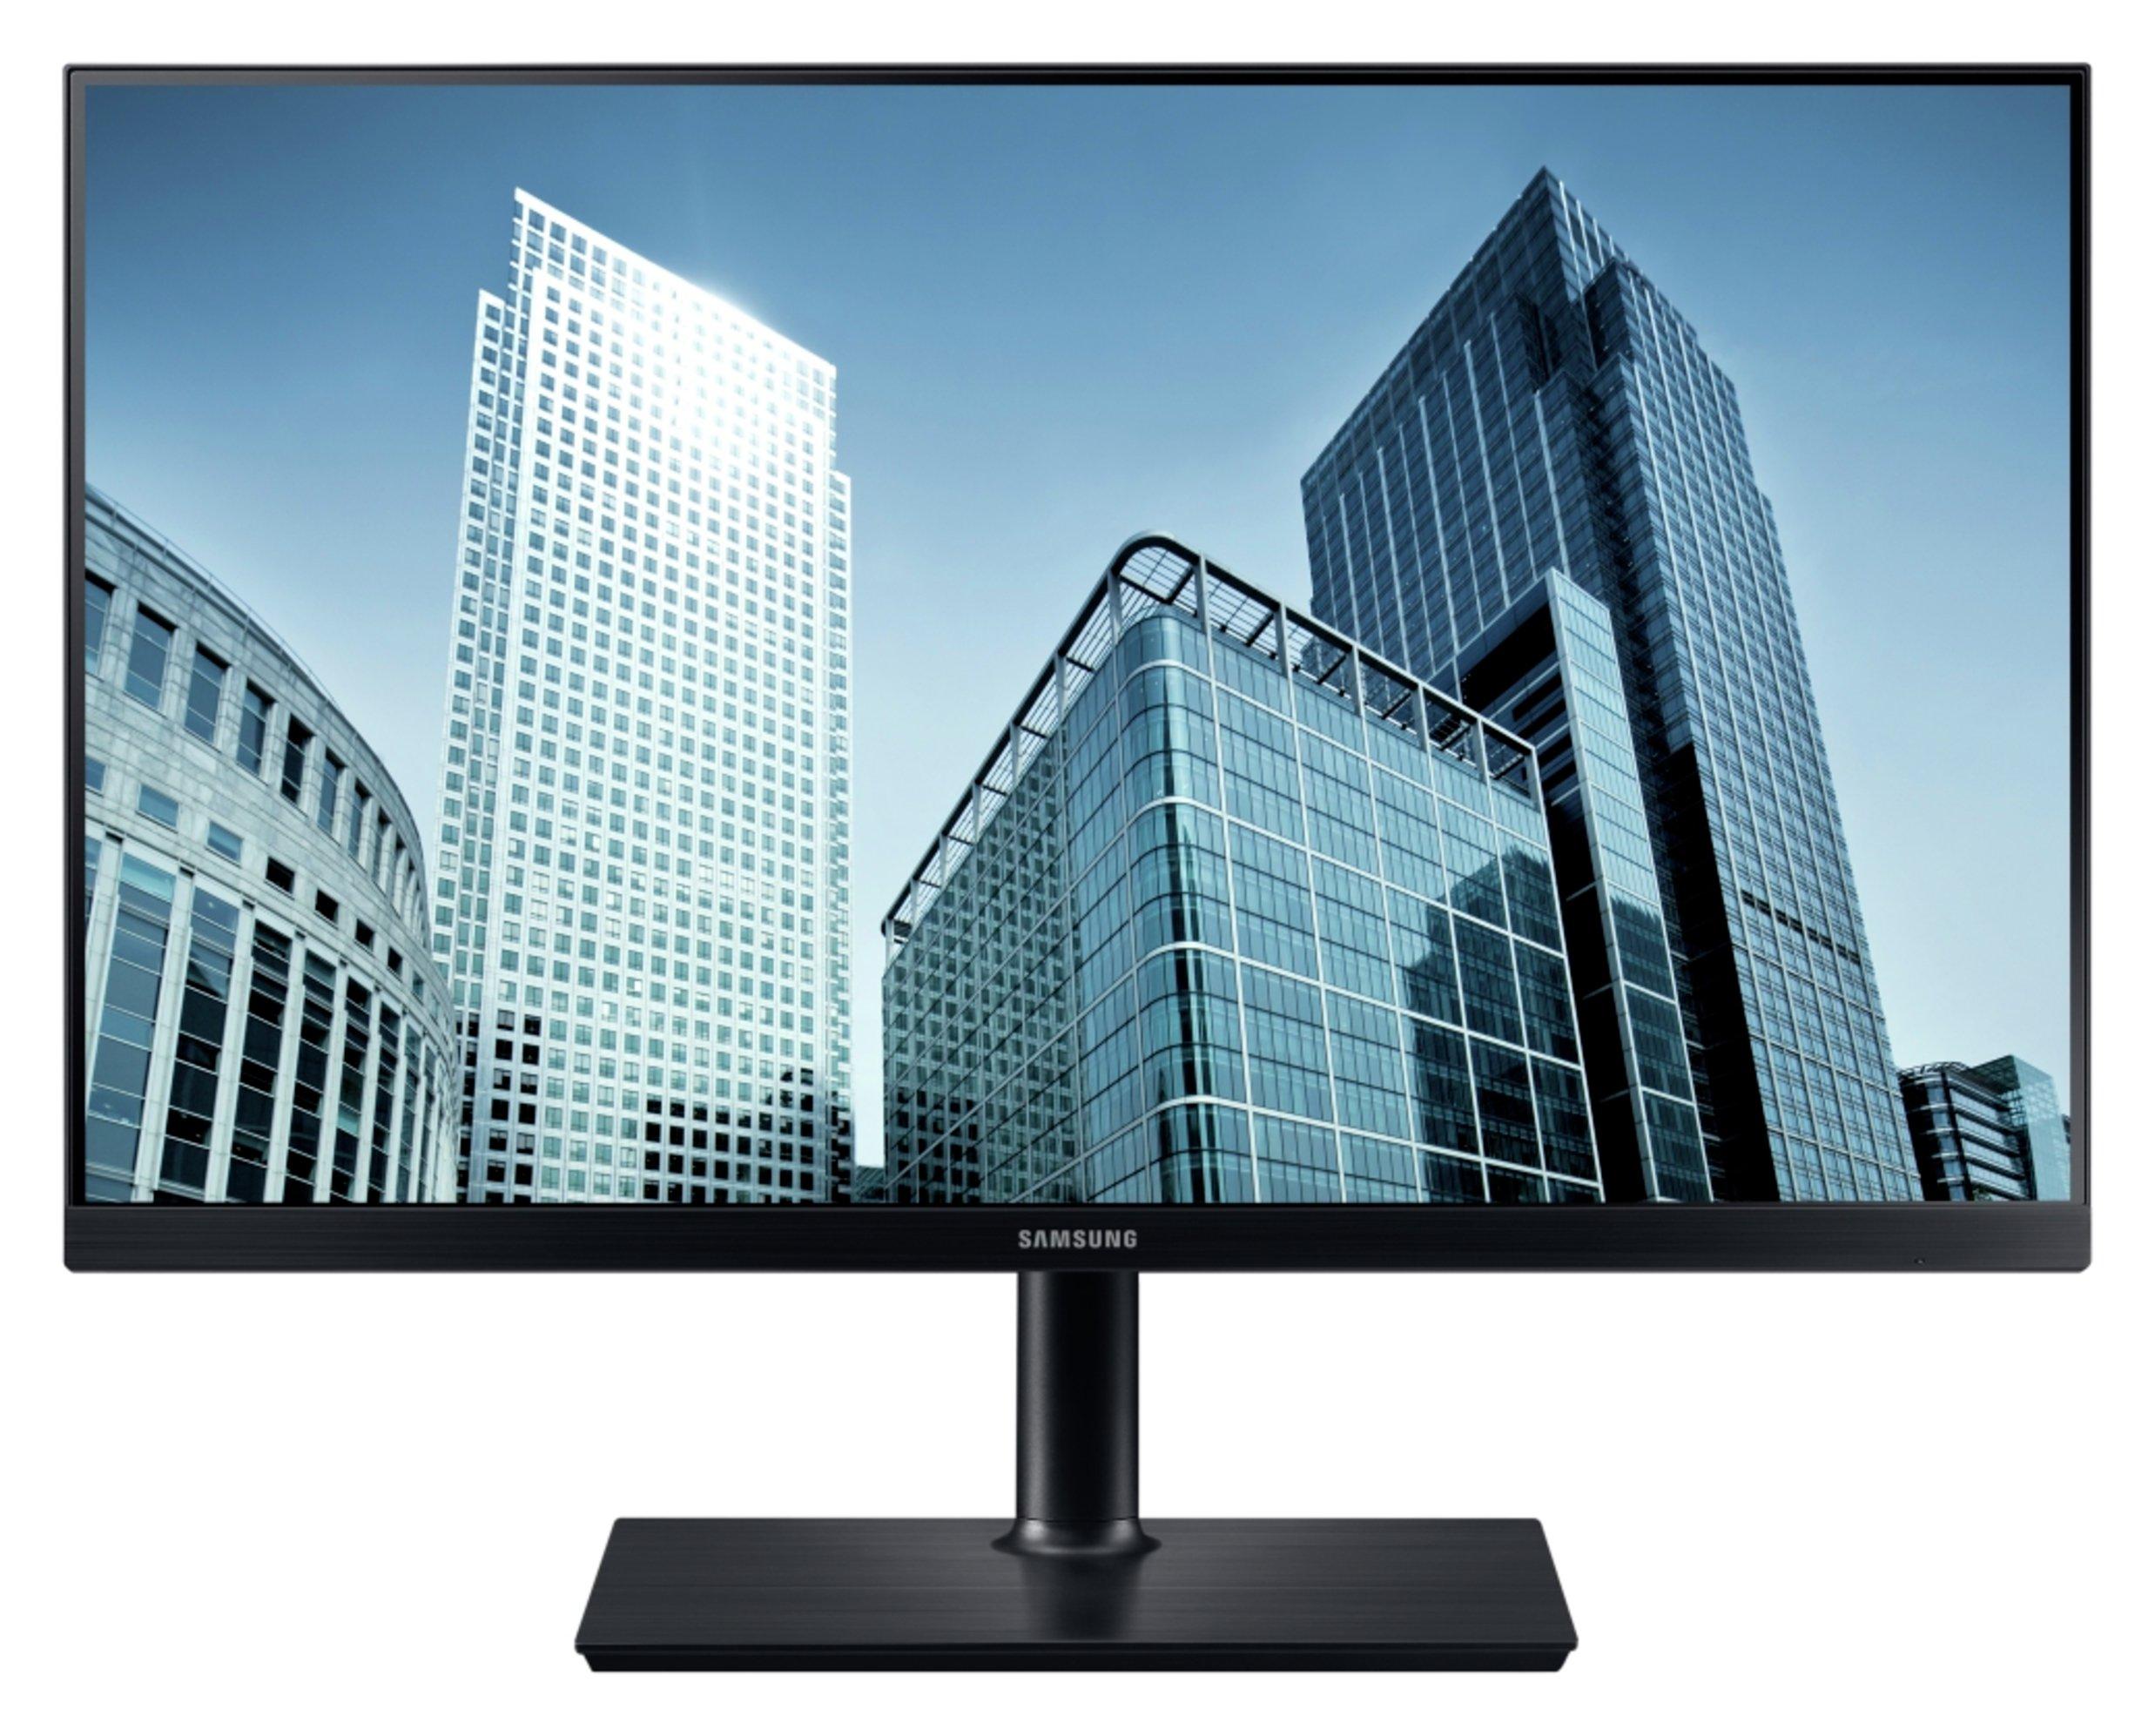 Samsung S24H850 WQHD 24 Inch LED Monitor